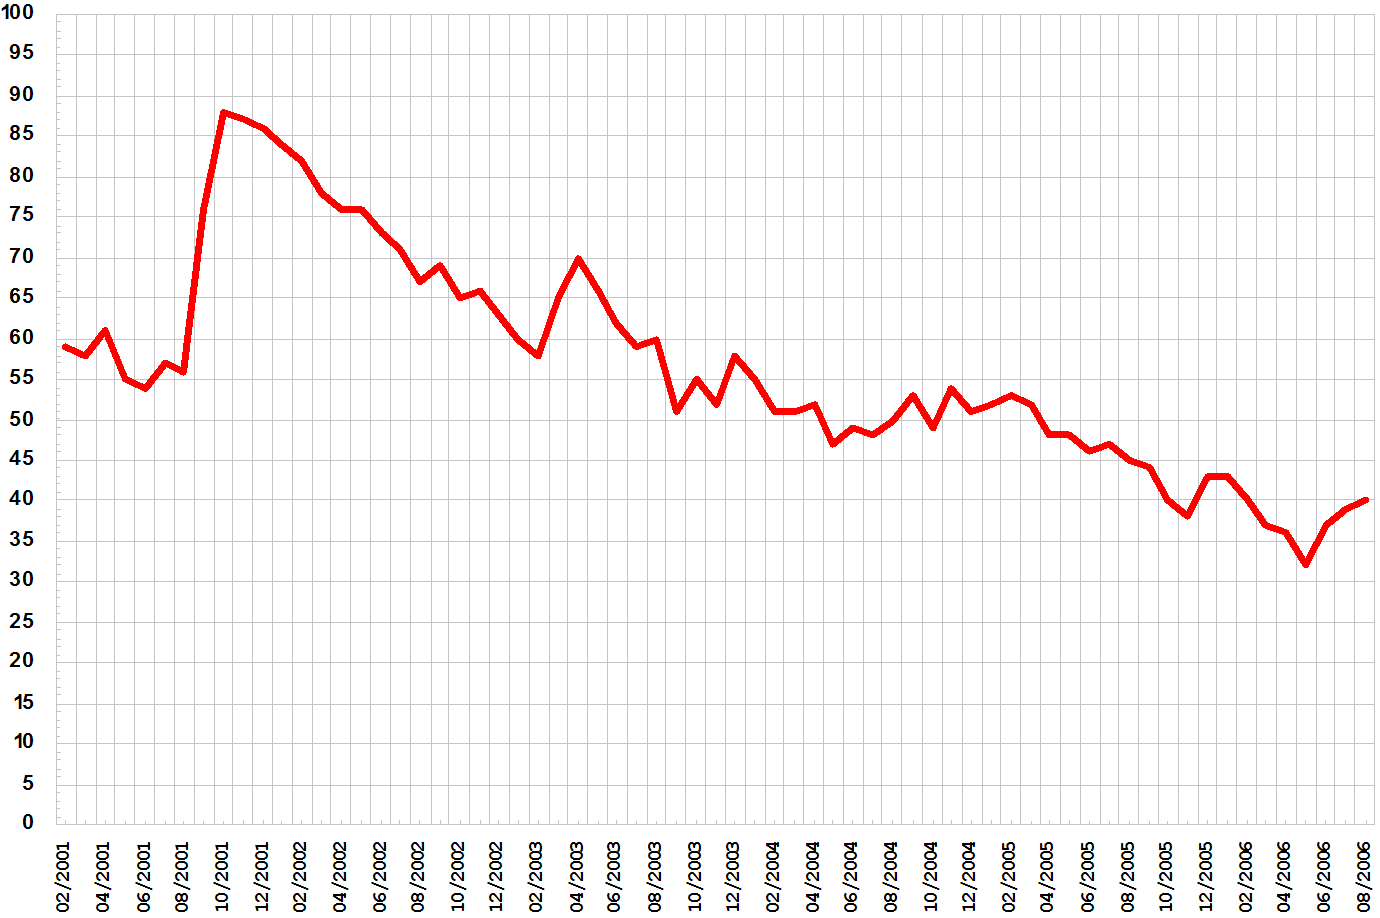 File:Bush approval ratings line graph.png.